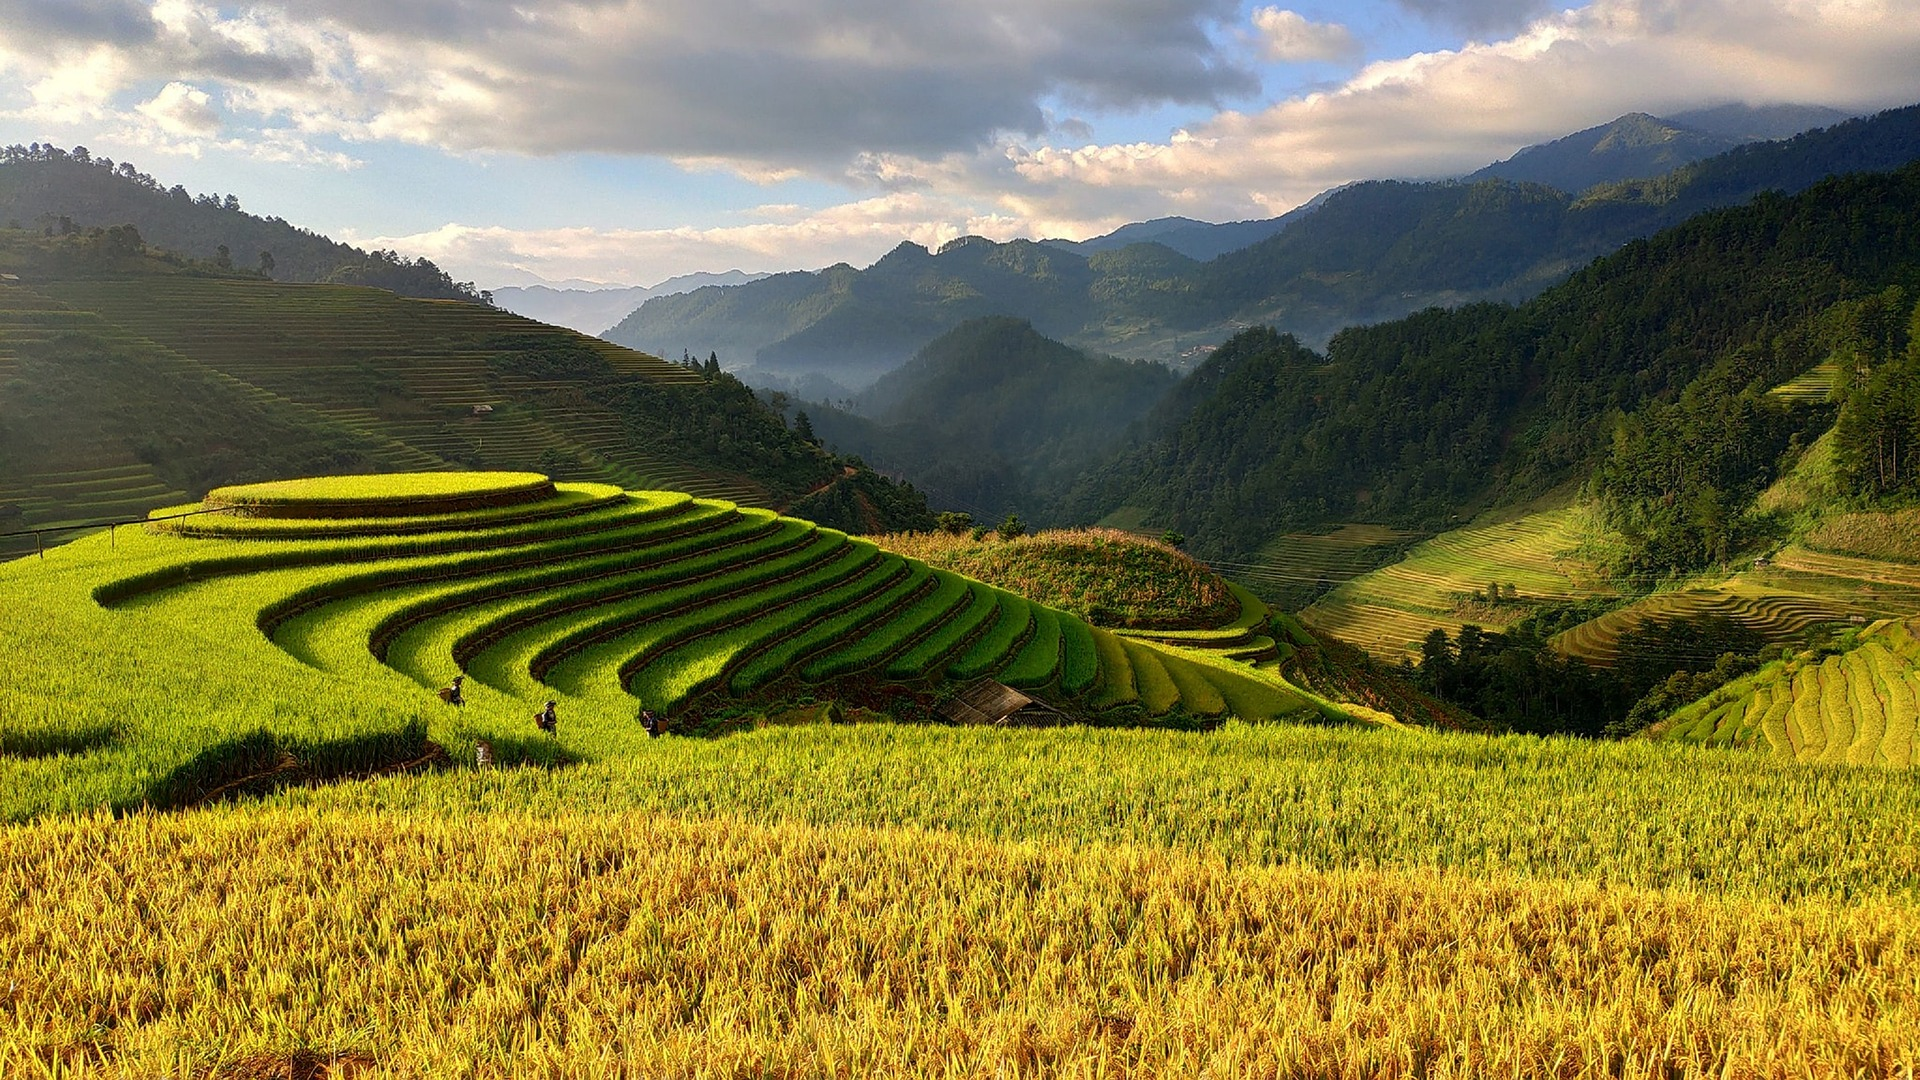 Destination image of Vietnam